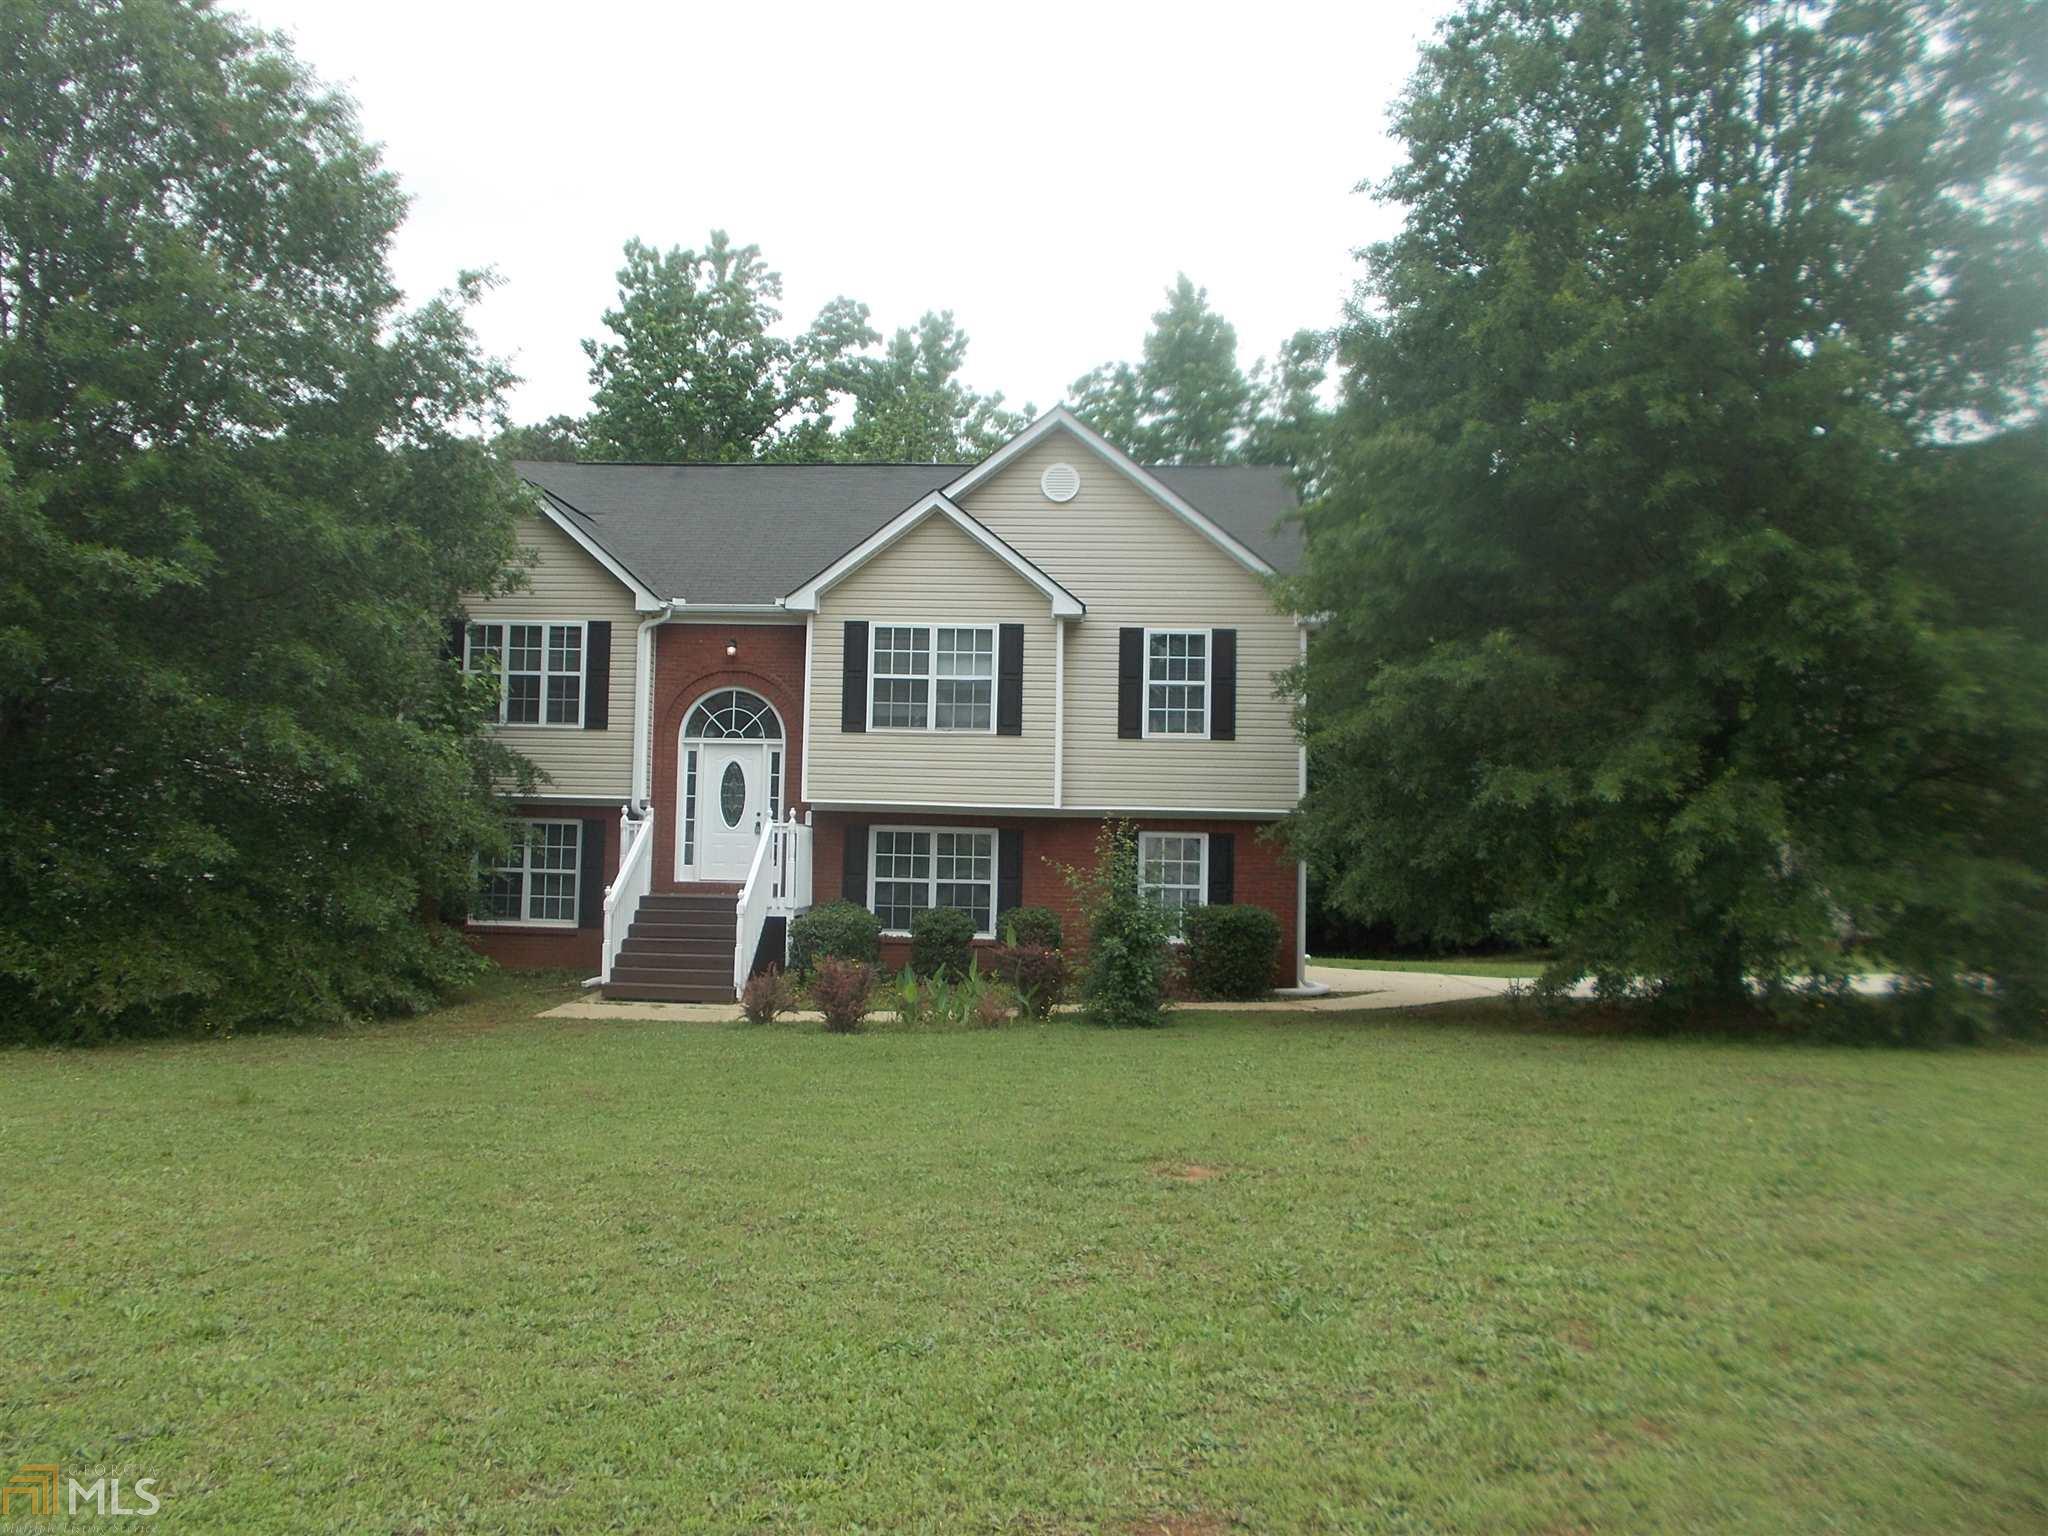 290 Greenfield Way, Covington, GA 30016